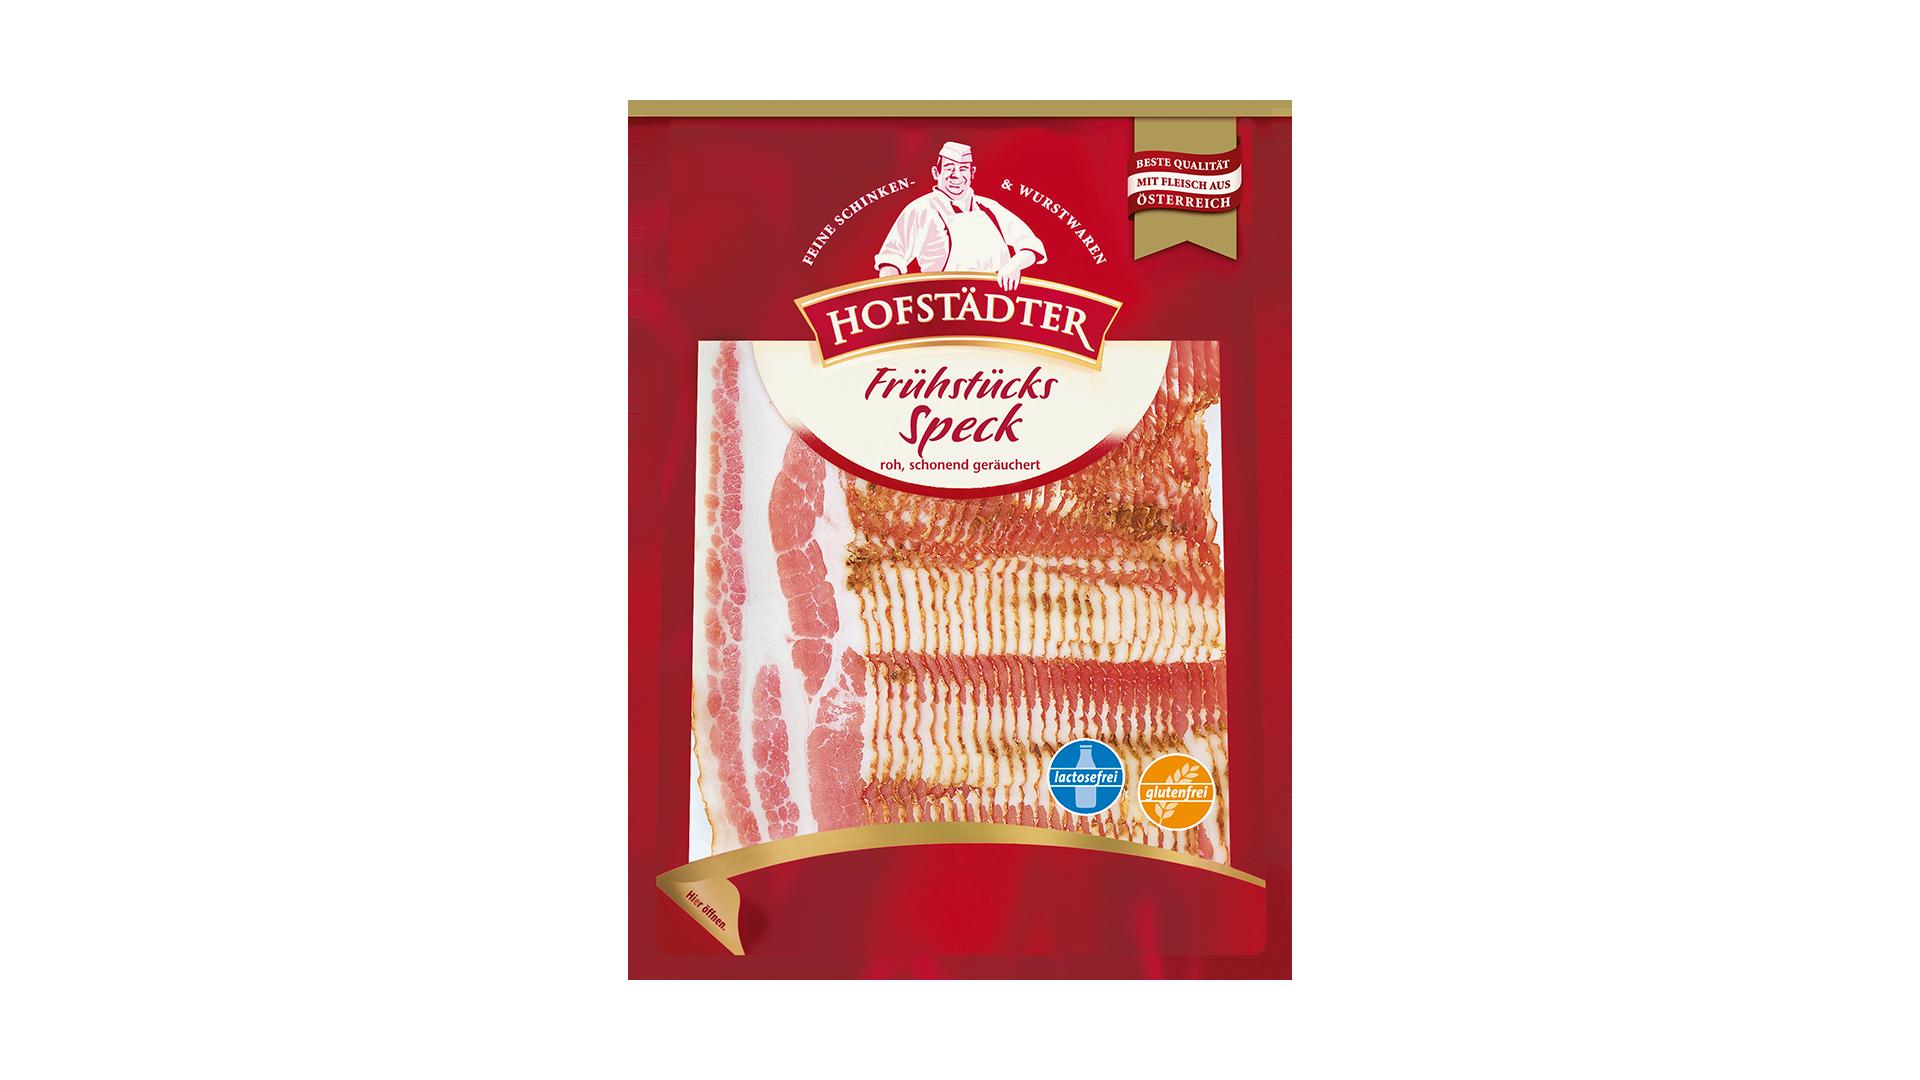 Hofstädter Frühstücksspeck